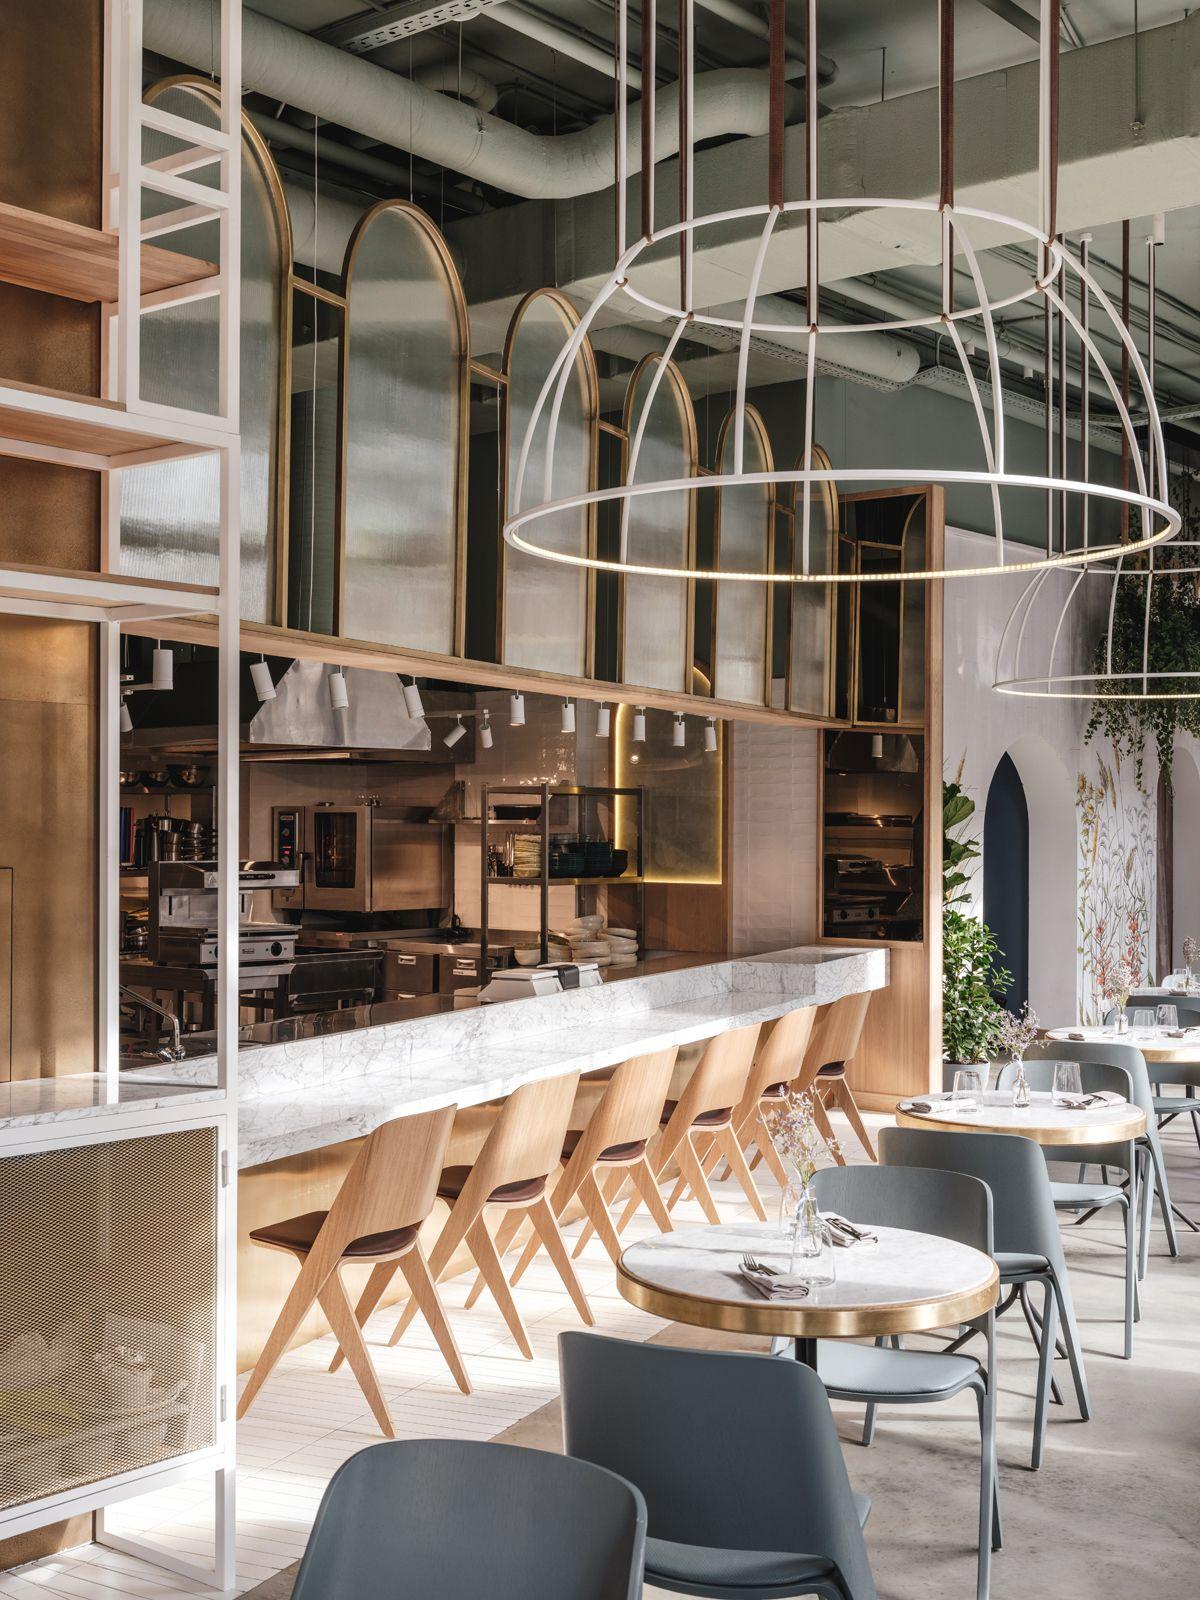 Housing Market Predictions 2021 Will It Crash In 2021 Or 2022 Hotel Interior Design Cafe Bar Interior Restaurant Interior Design